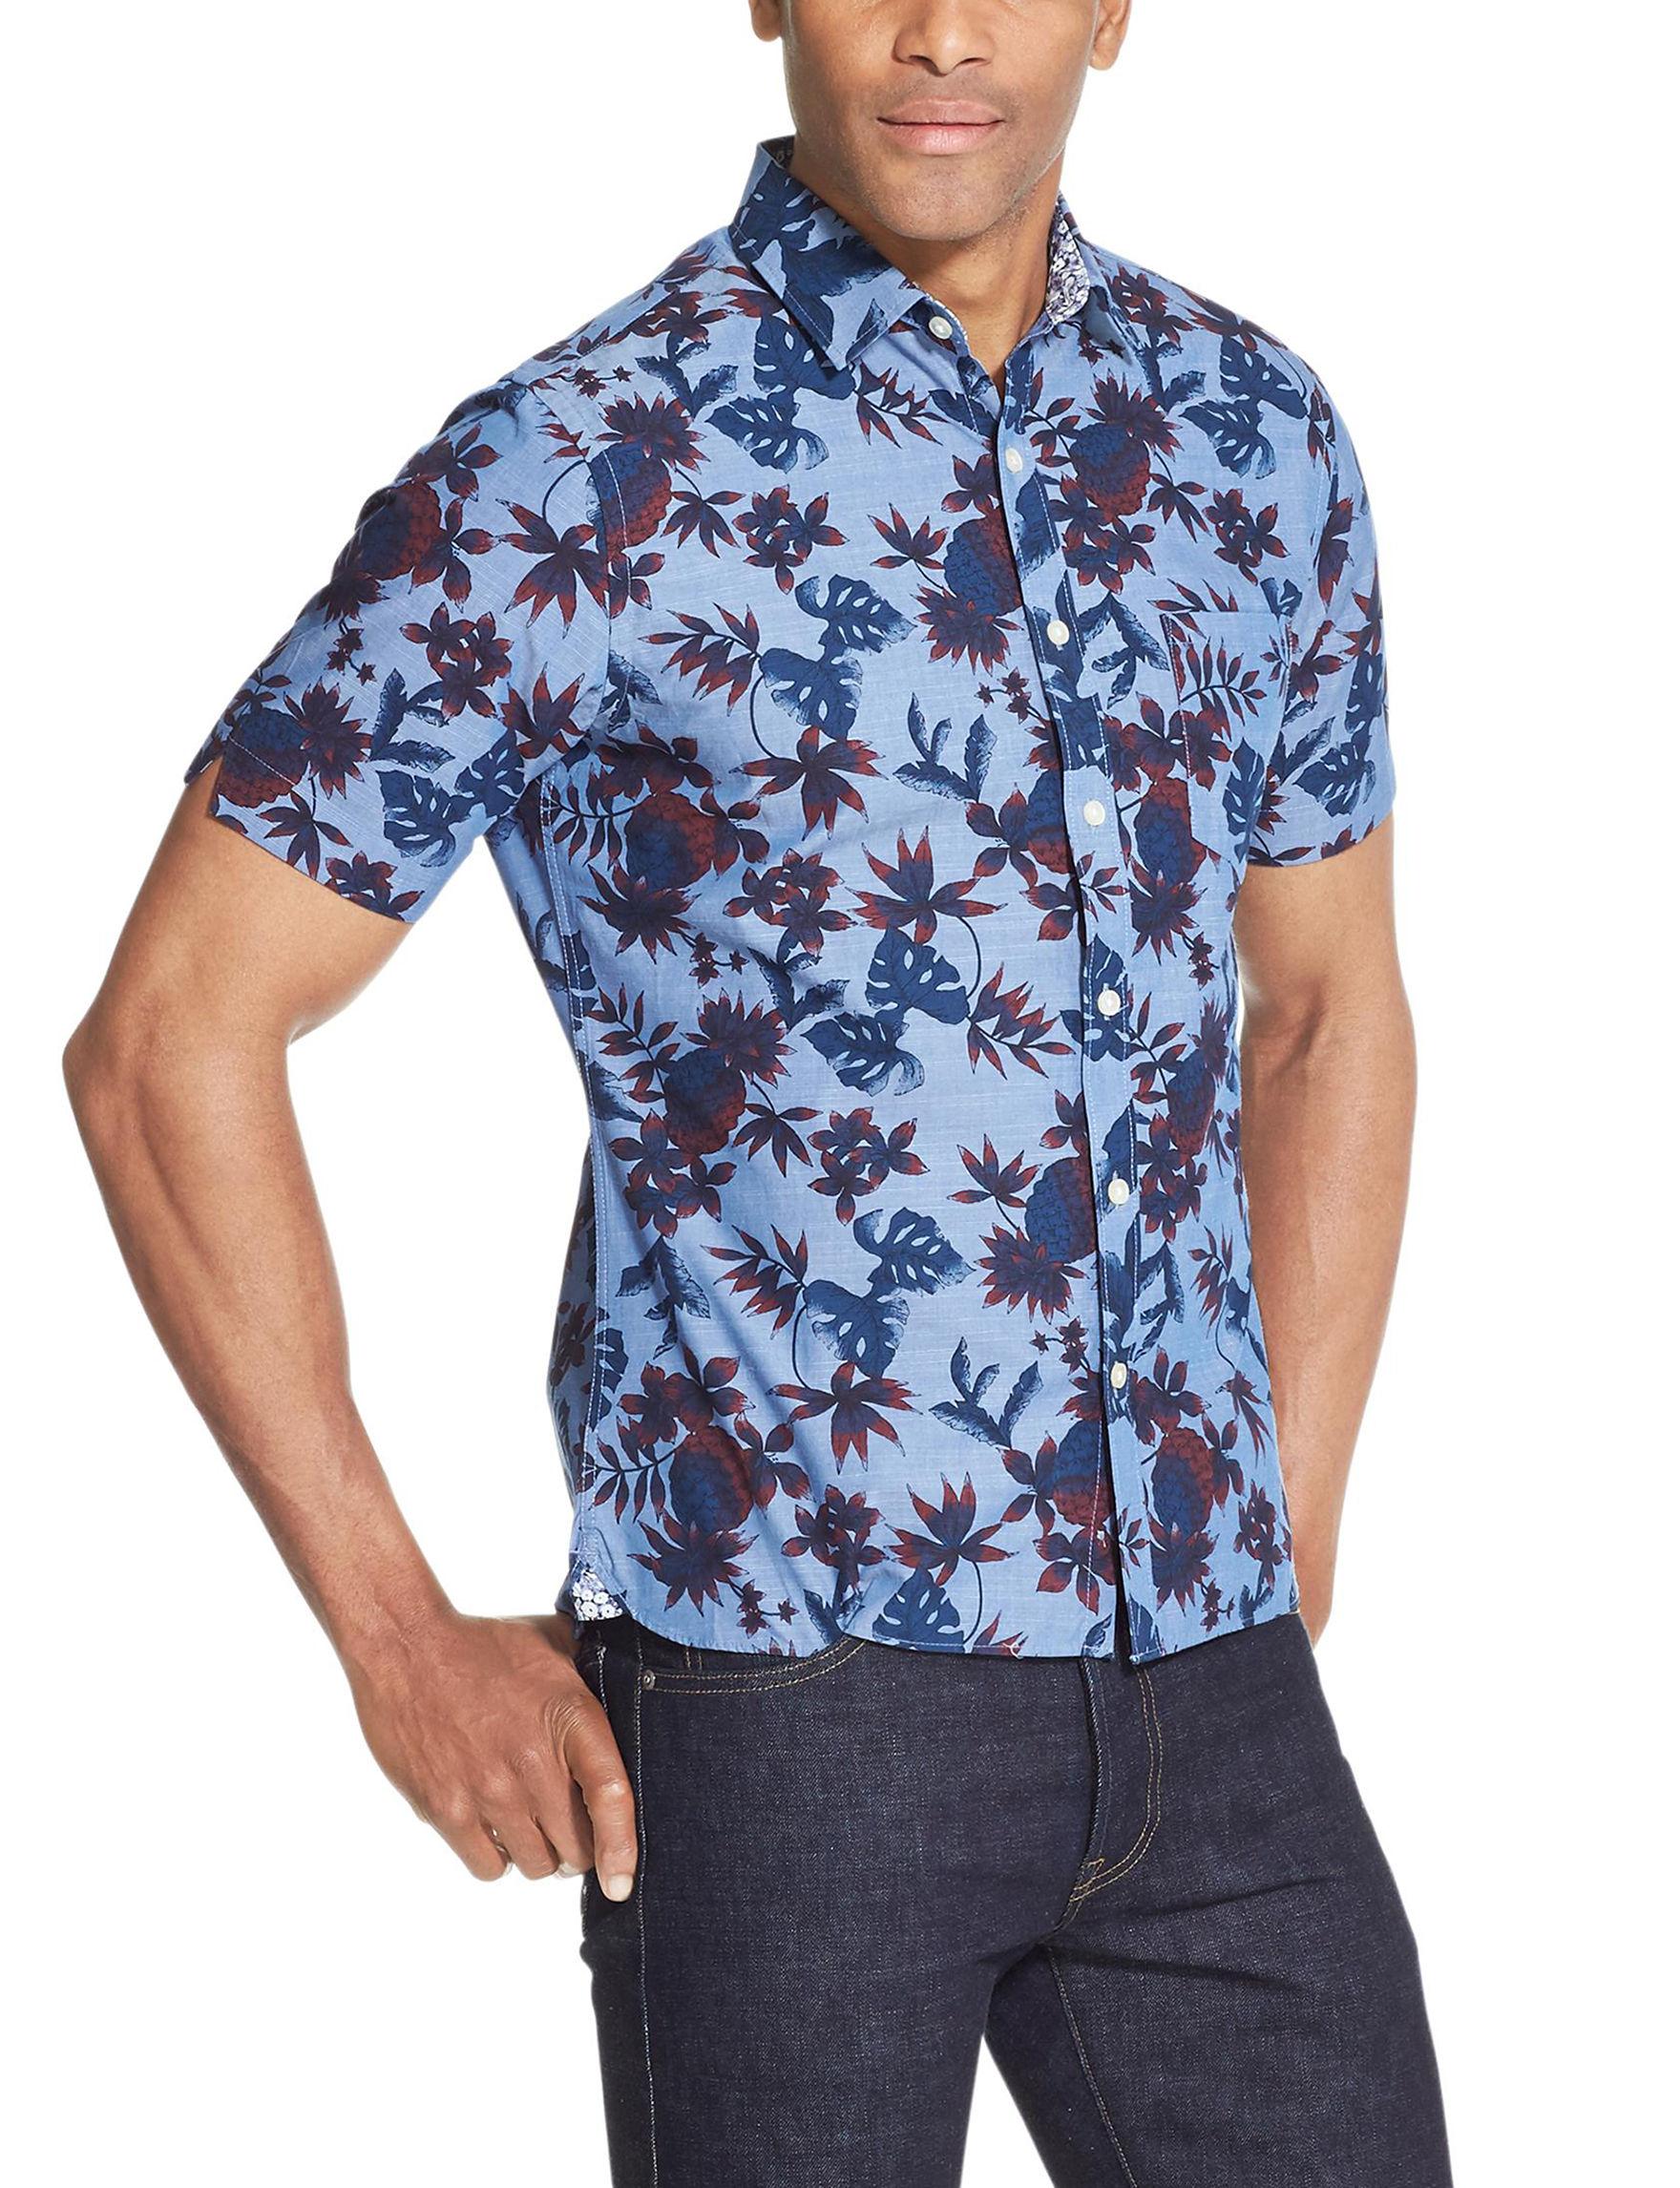 Van Heusen Dark Blue Casual Button Down Shirts